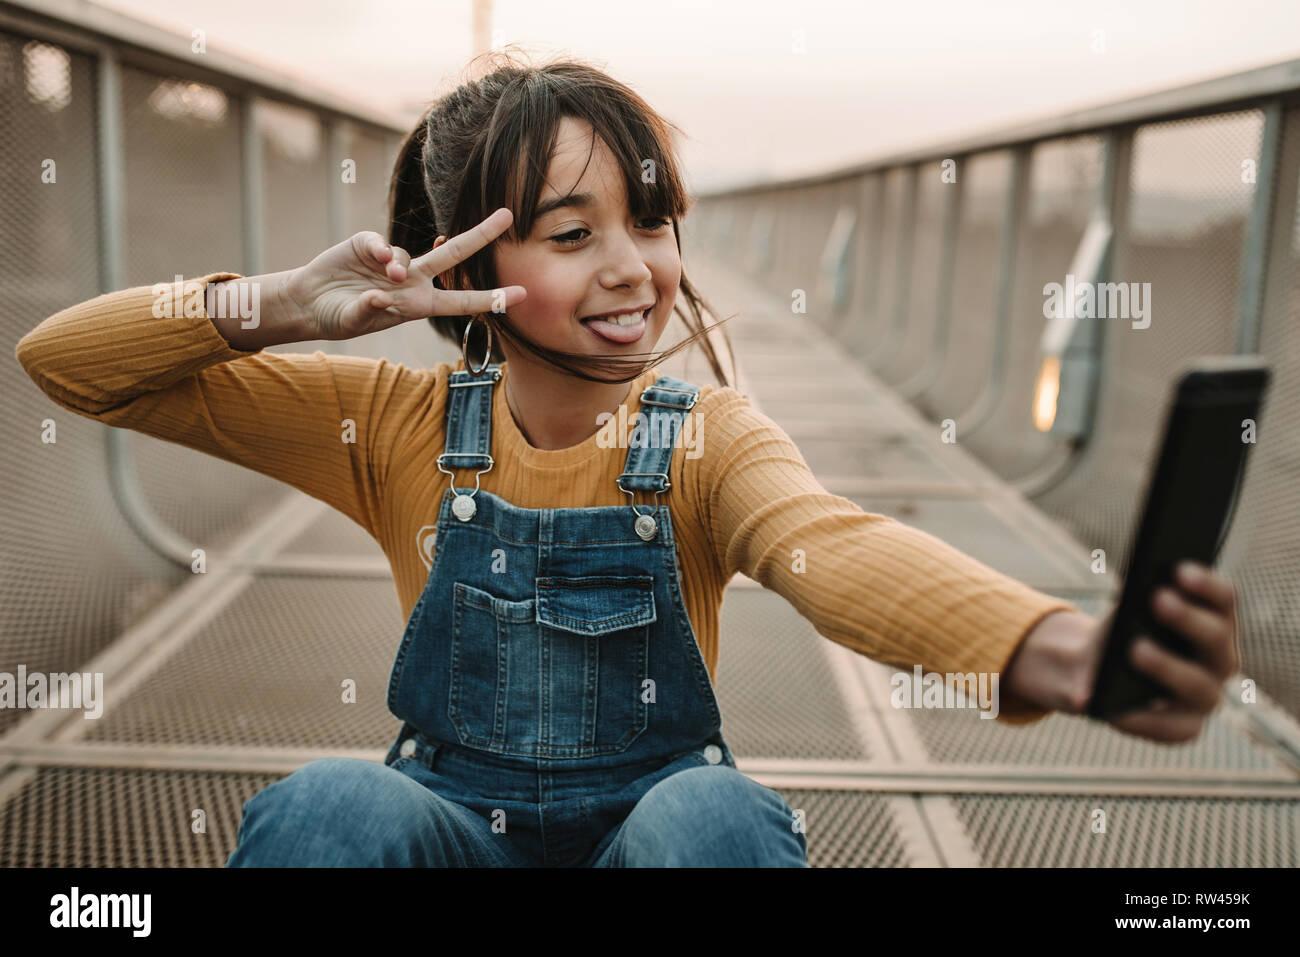 Funny Girl unter selfie auf dem Smartphone auf Gehweg Stockbild